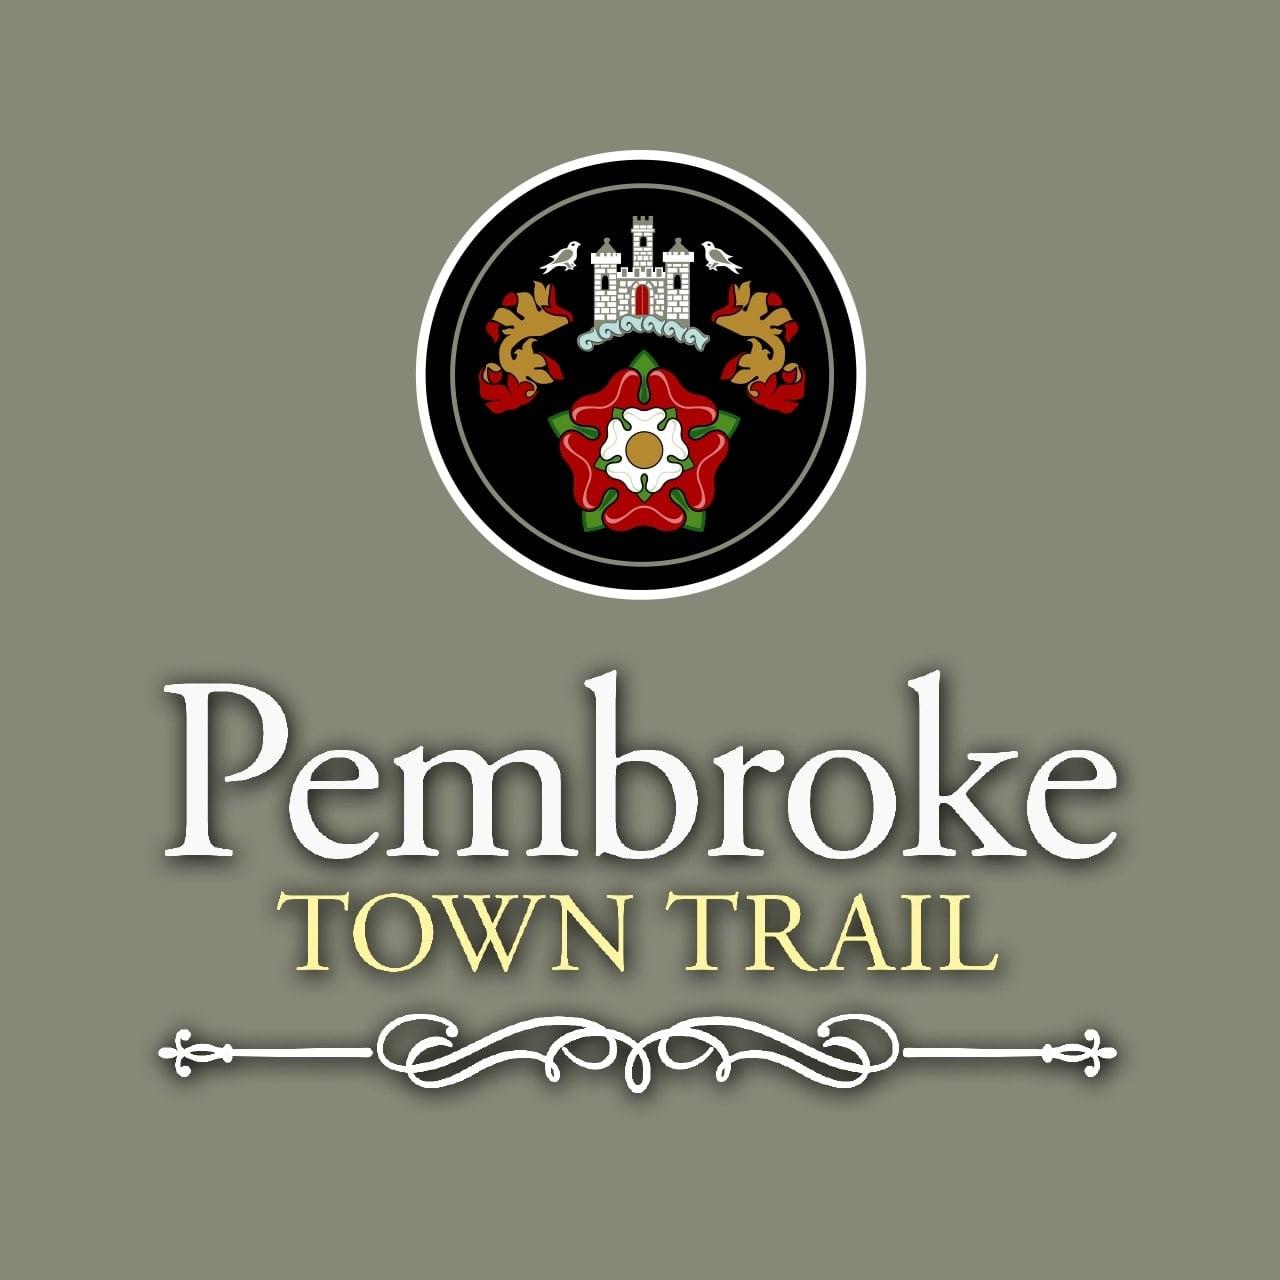 Pembroke Town Trail WebsiteWeb Design Case Study